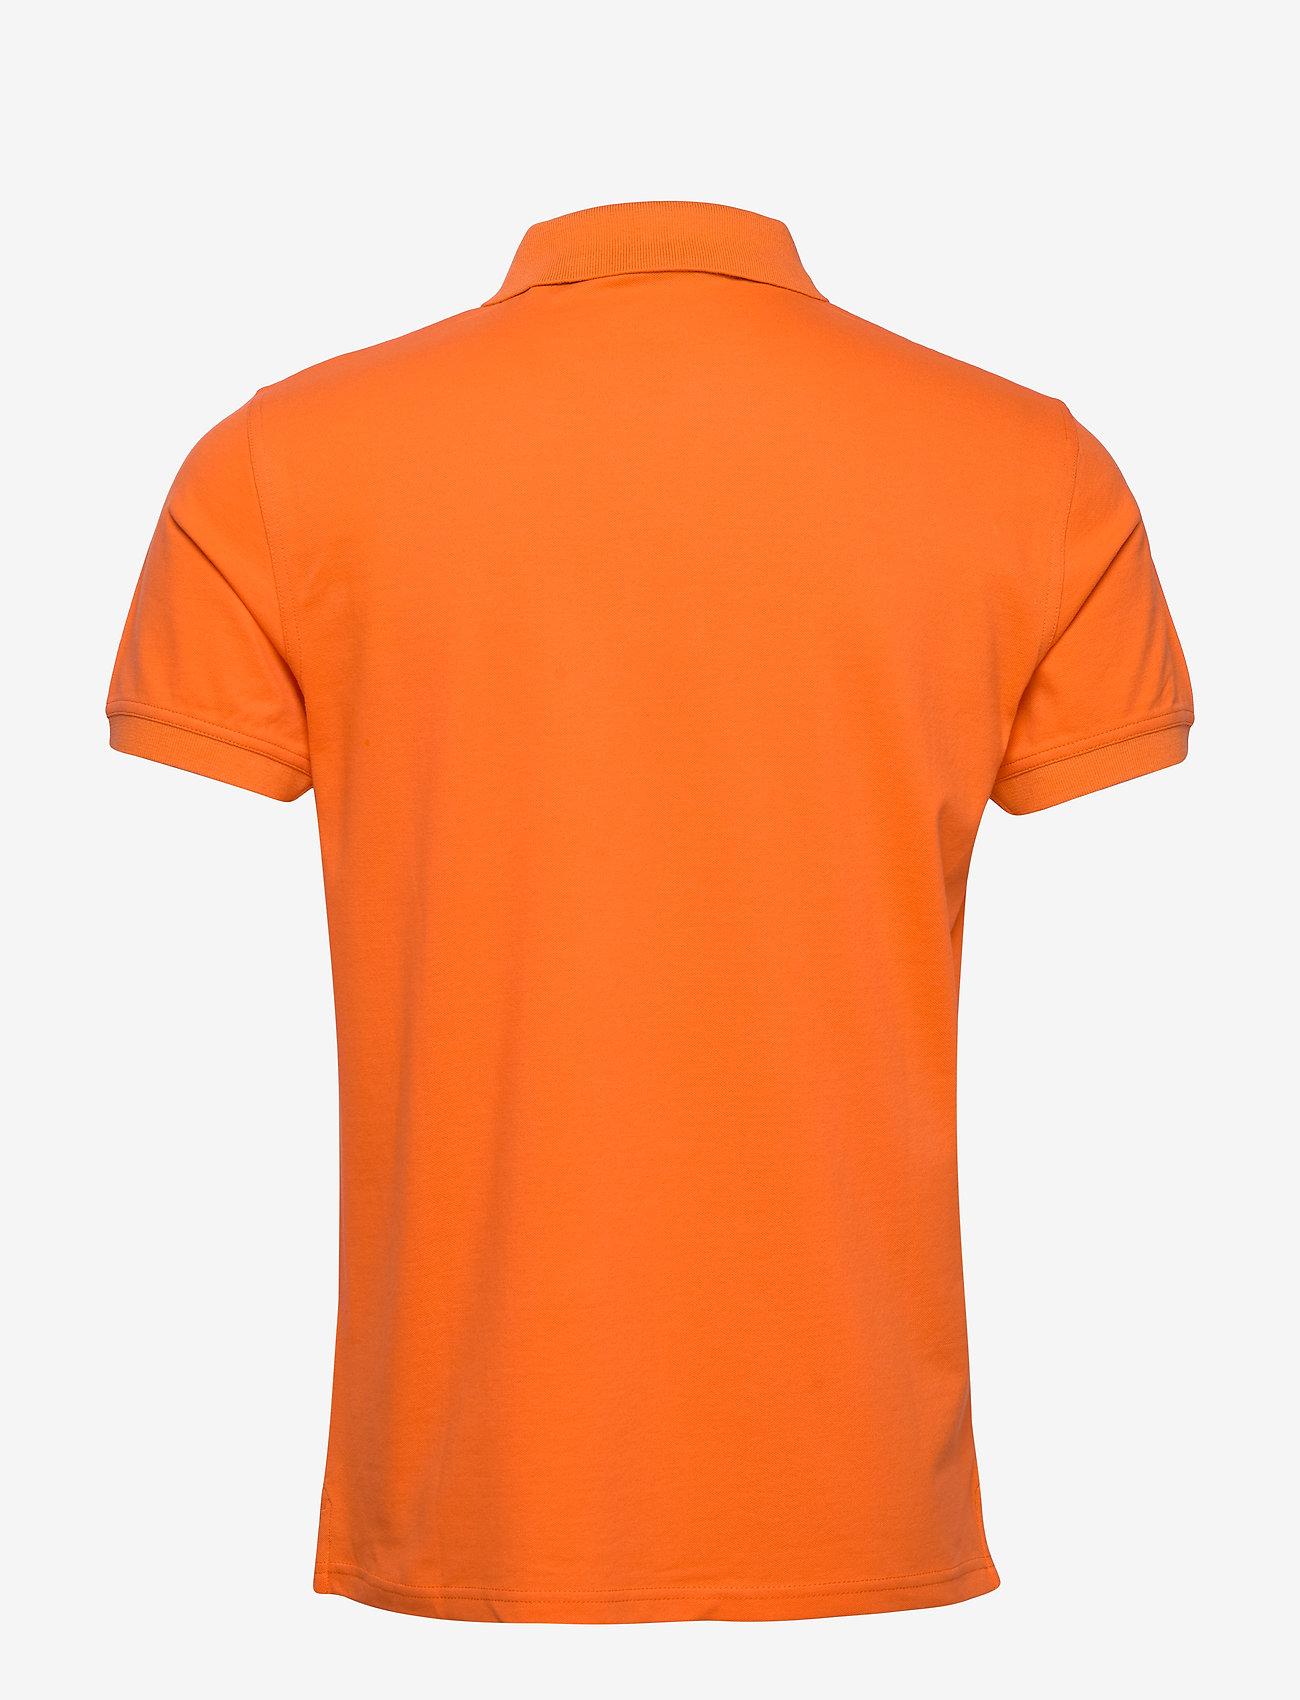 GANT - CONTRAST COLLAR PIQUE SS RUGGER - short-sleeved polos - sunny orange - 1